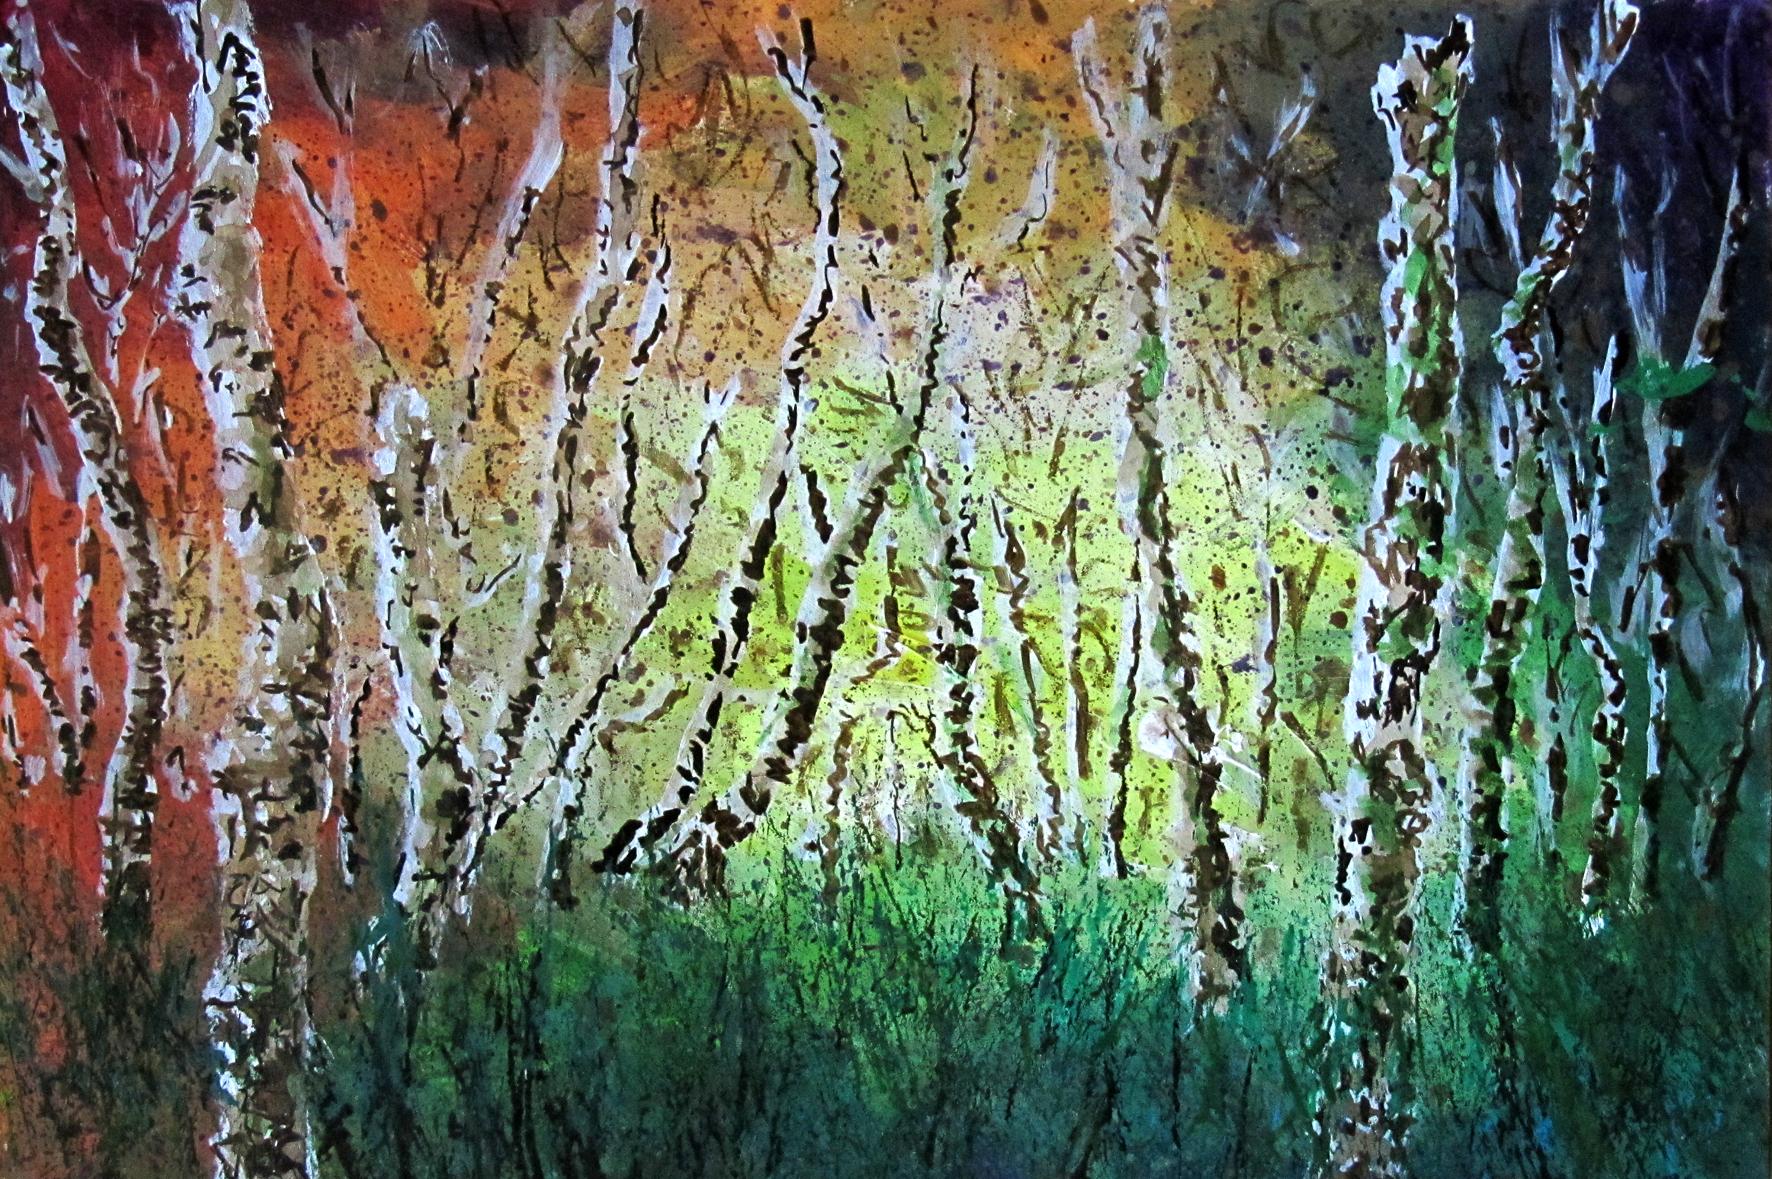 Arne, birch trees